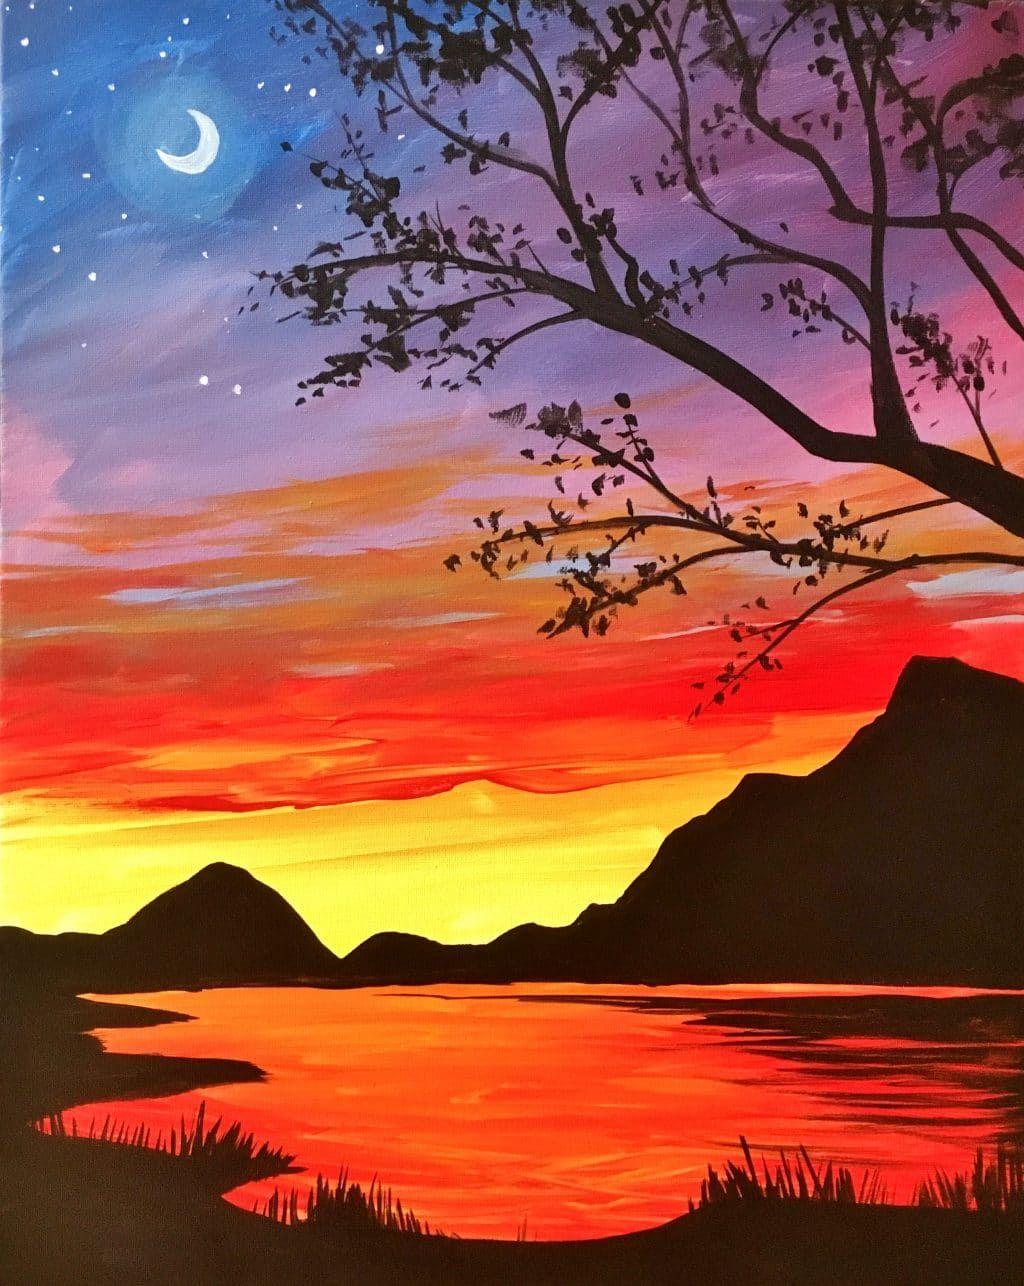 Paintings Sunrise Art Painting Mountain Sunset Painting Sunset